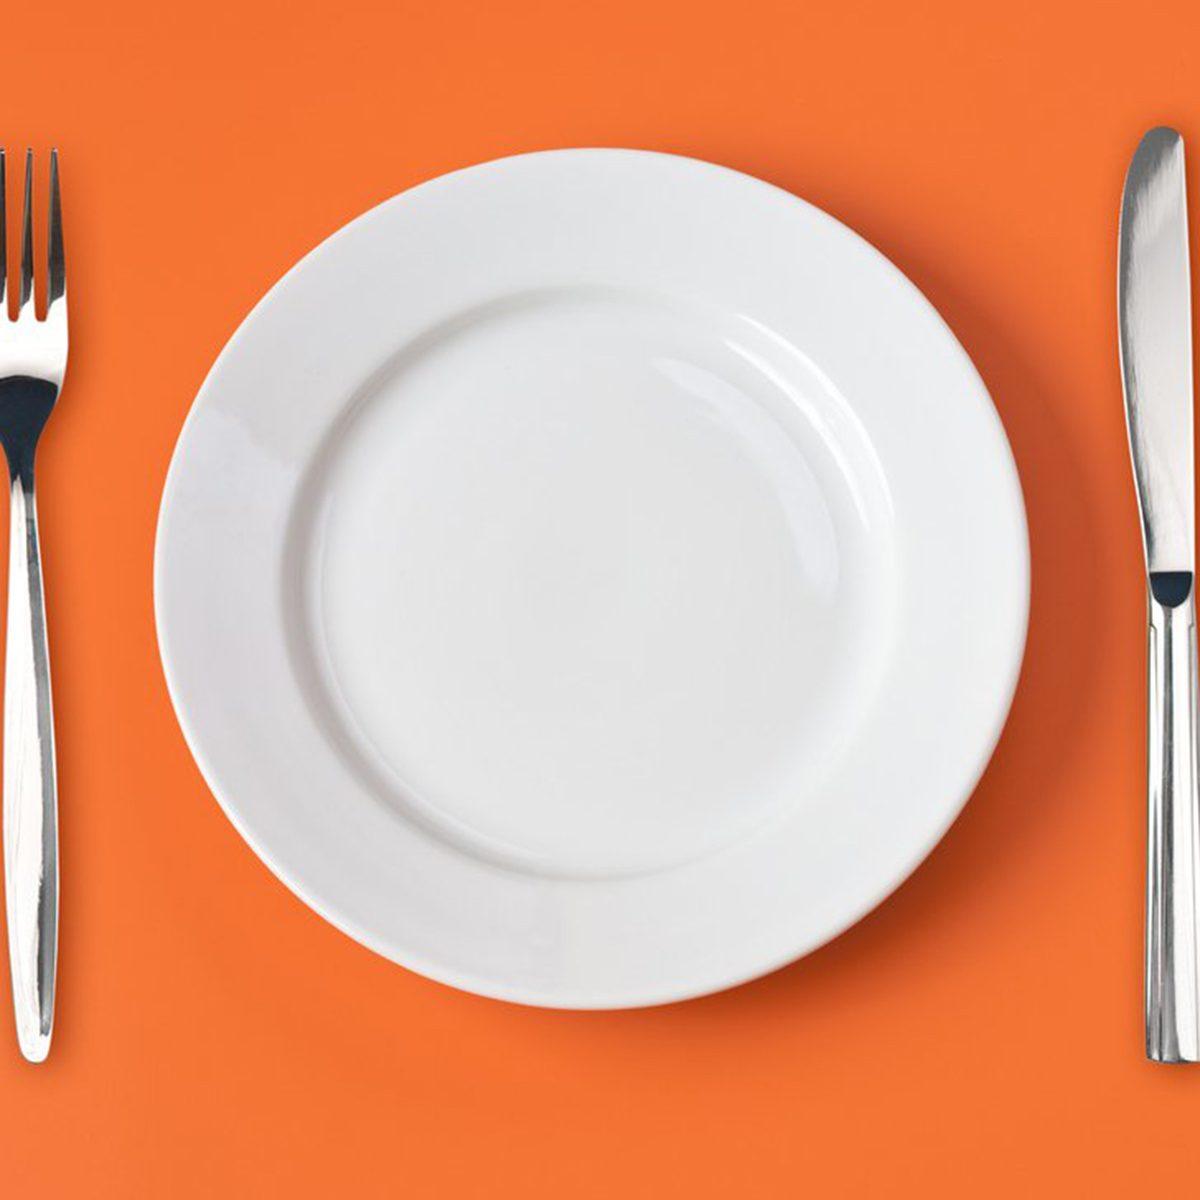 Dinner plate on an orange background